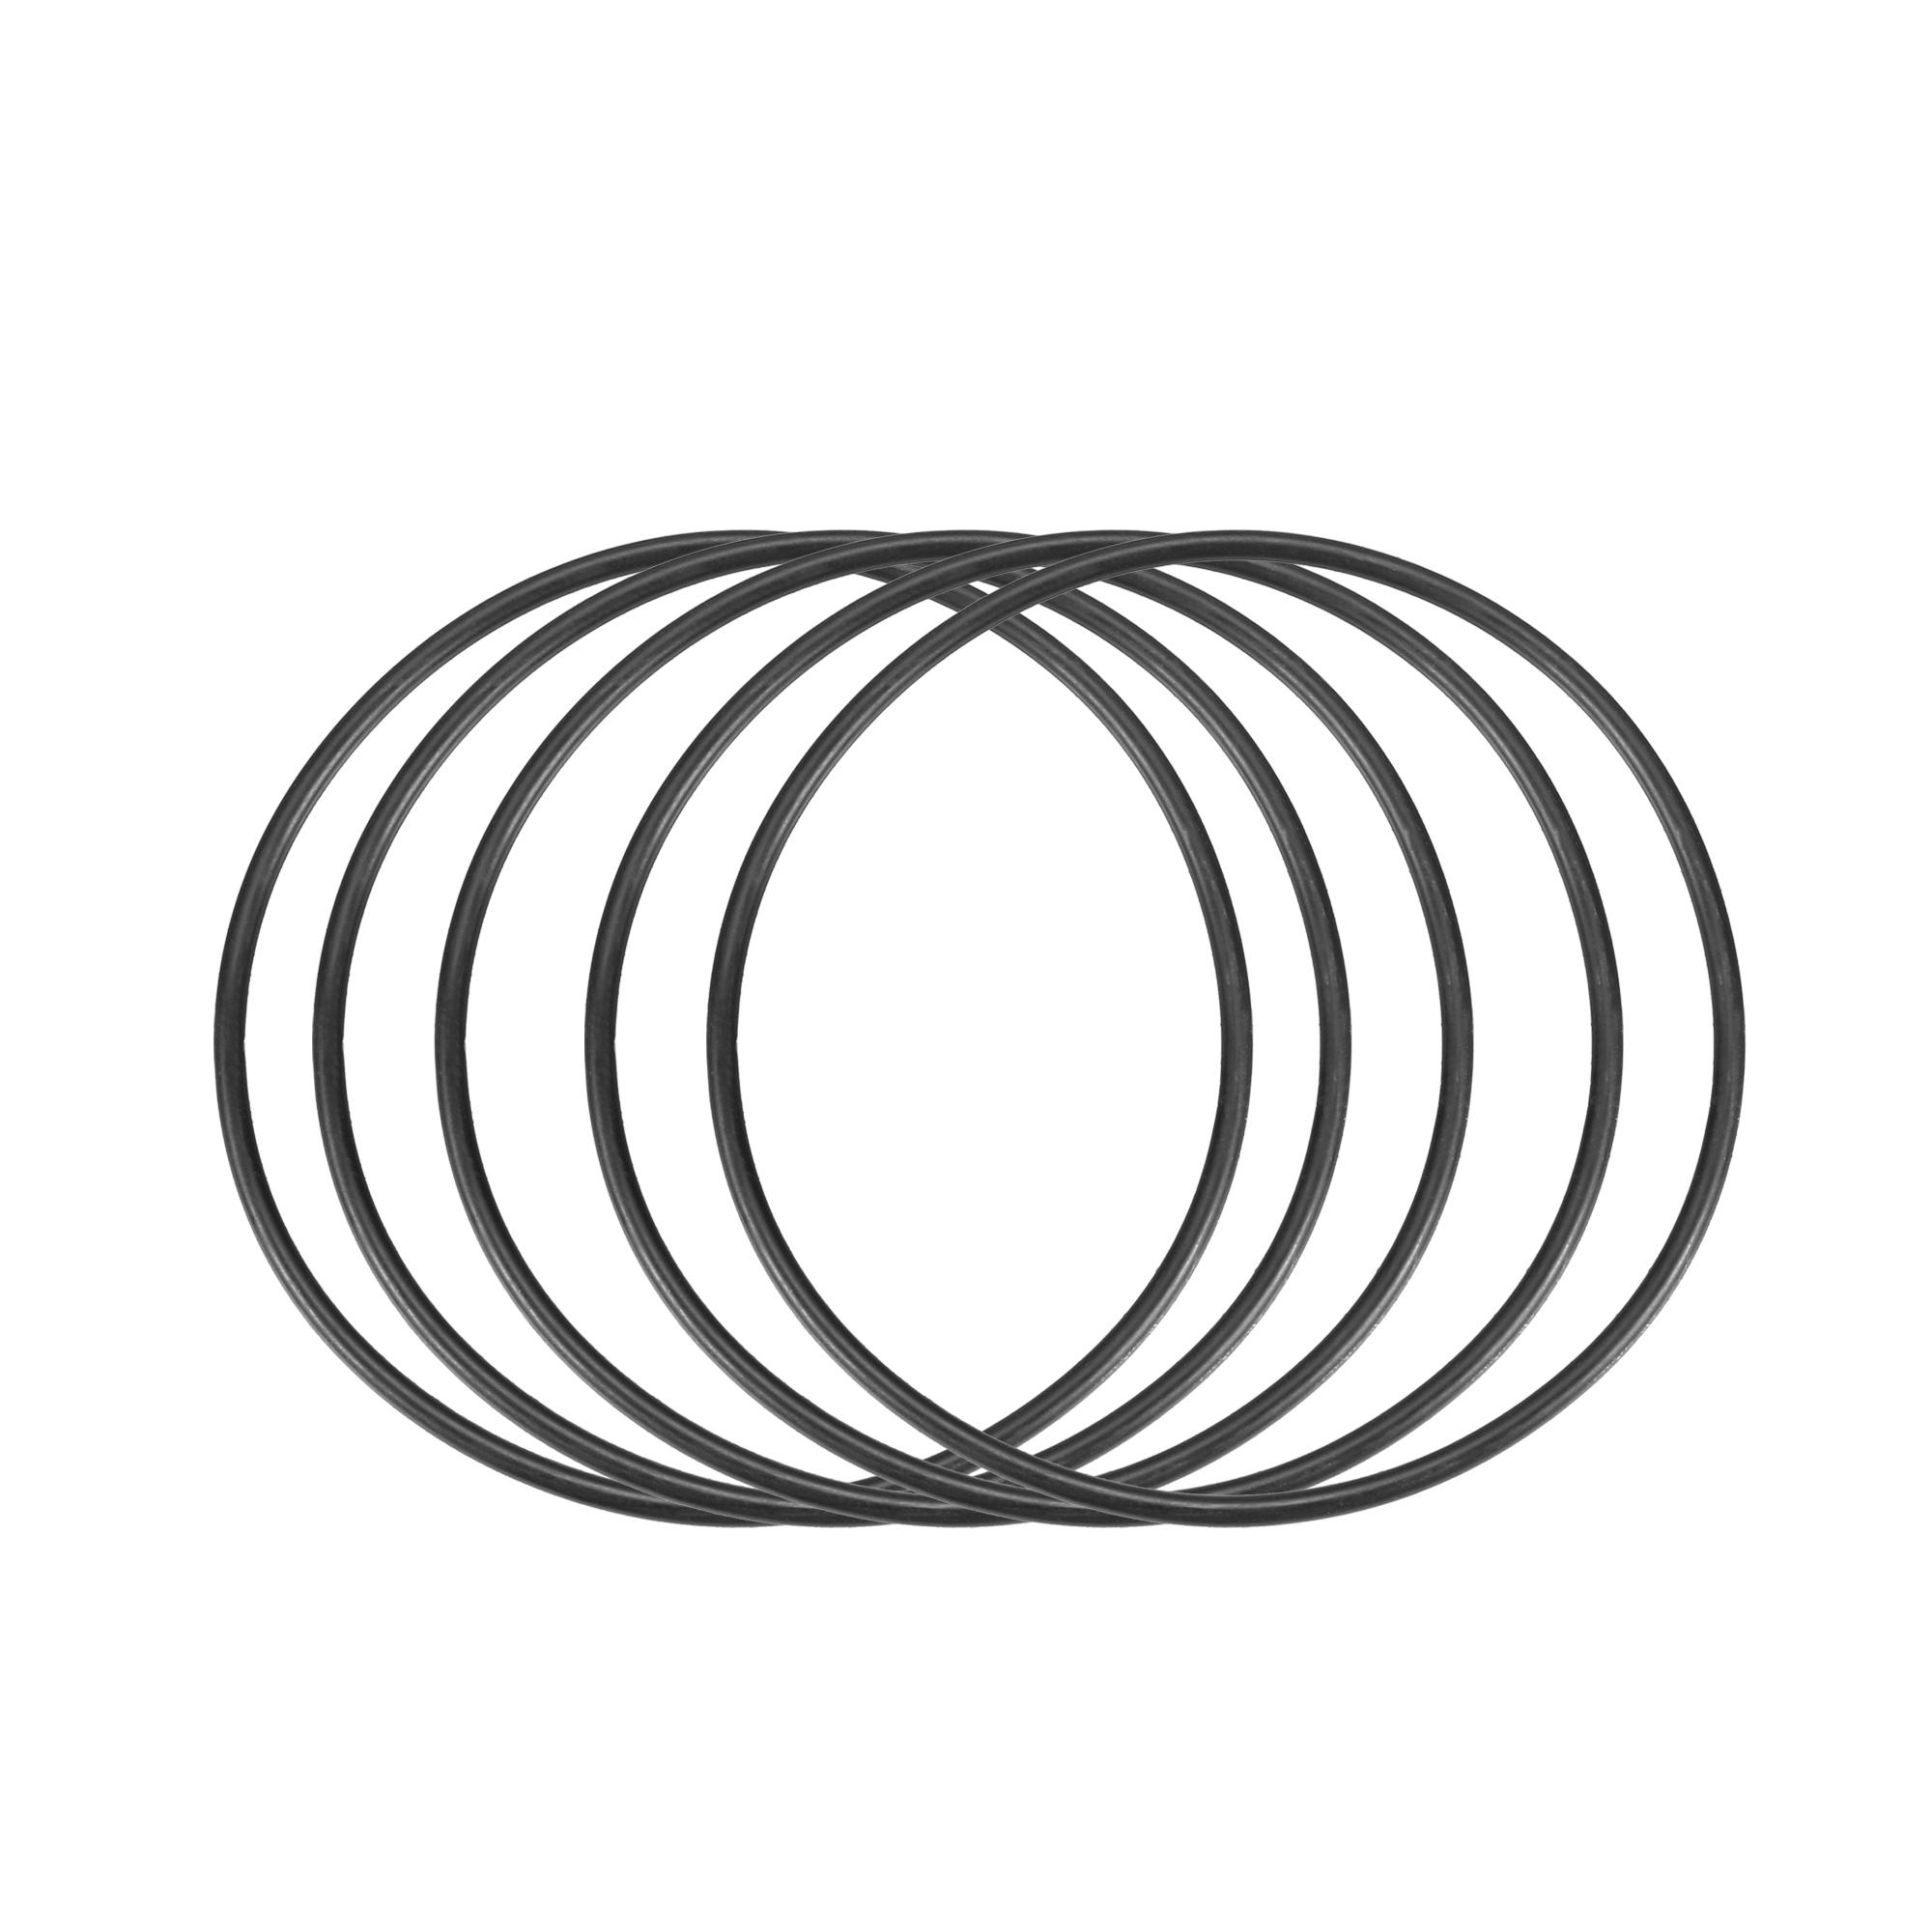 5 Pcs 66mm Diameter x 2mm Height O Type Sealing Ring Black Rubber